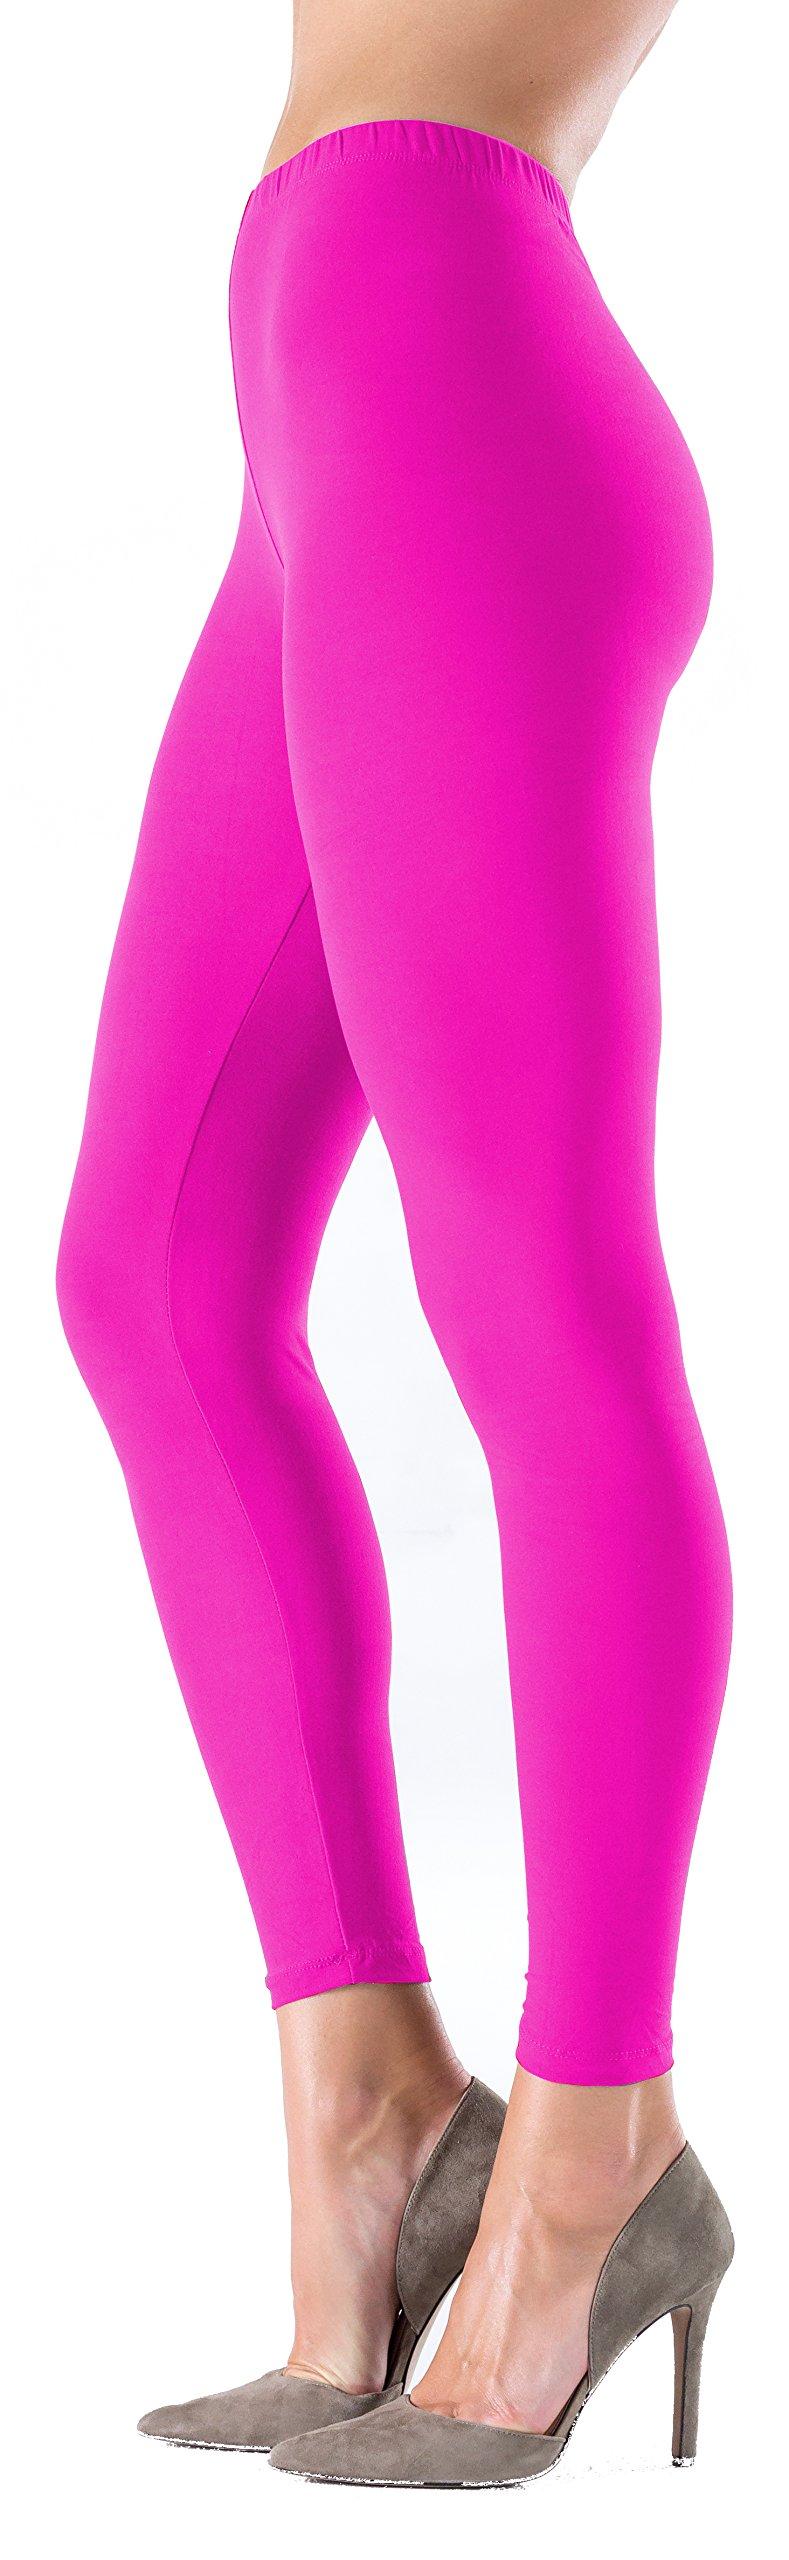 c4700ccac635f LMB Women?s Soft Classic Leggings Stretch Fit Sexy Contour 40+ Colors One  Size